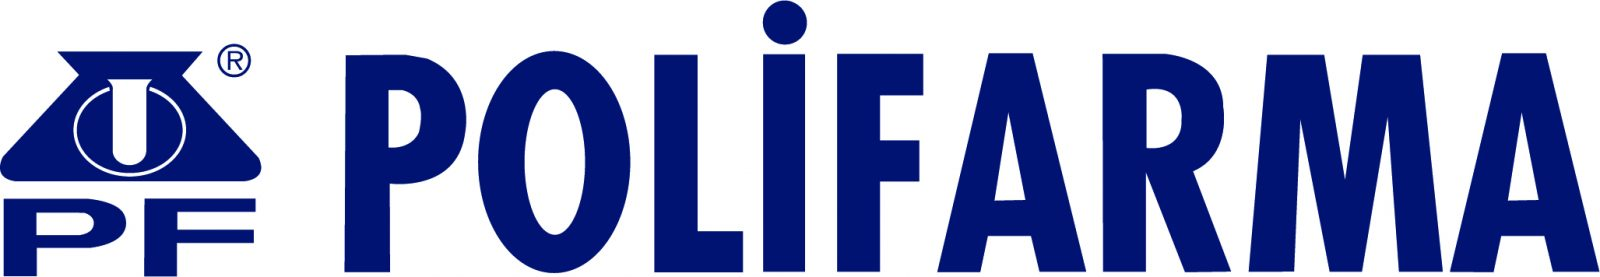 Polifarma logo yatay kullanım tek